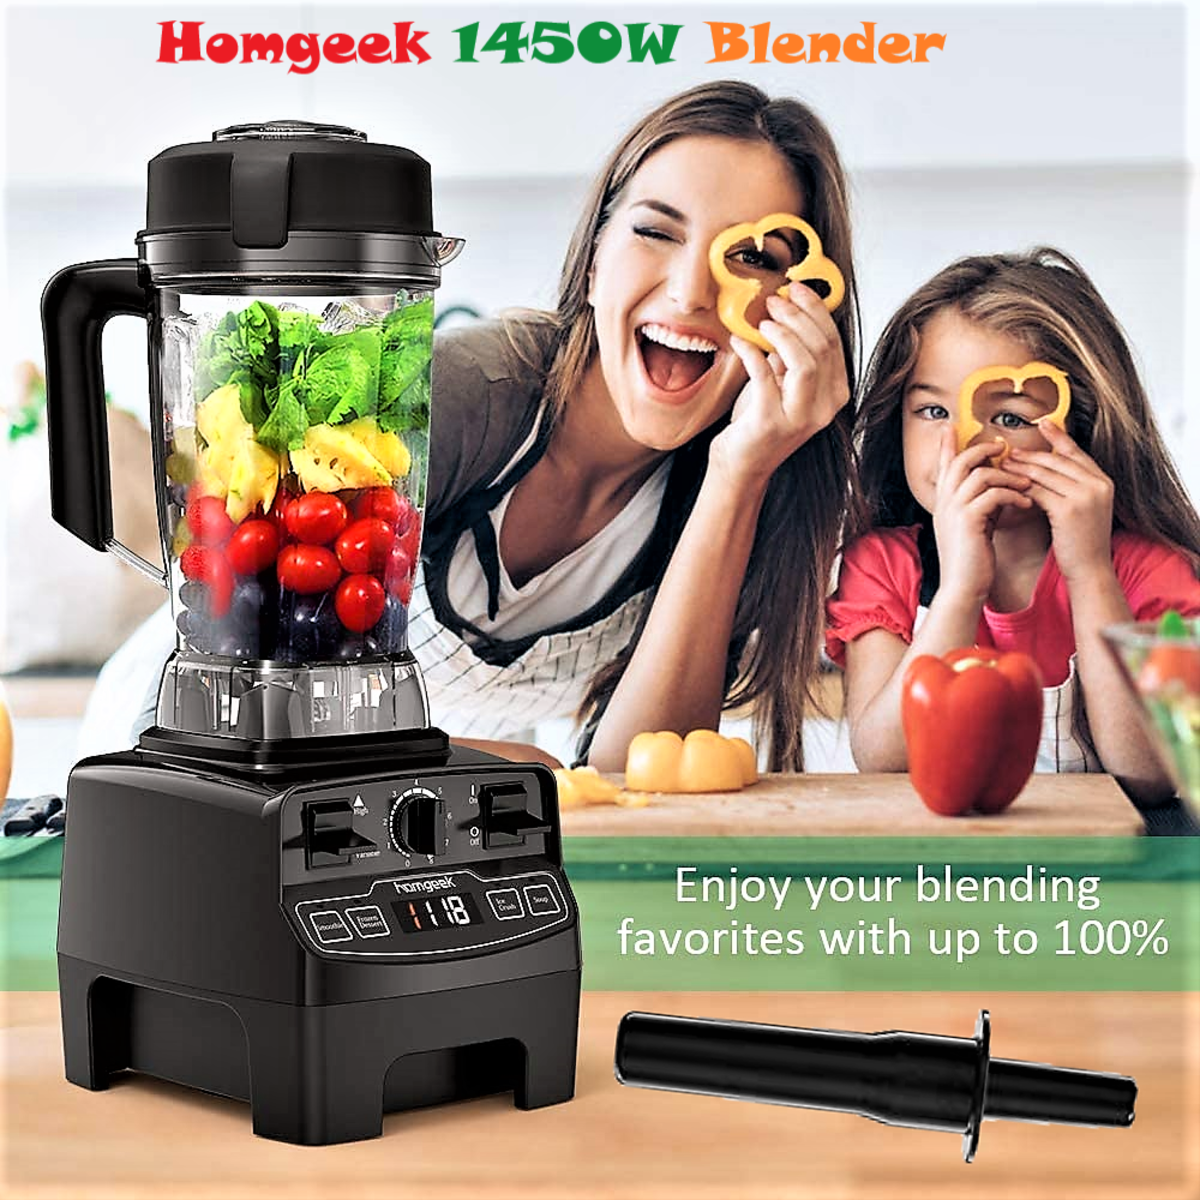 Homgeek 1450W High Speed Blender & Smoothie Maker